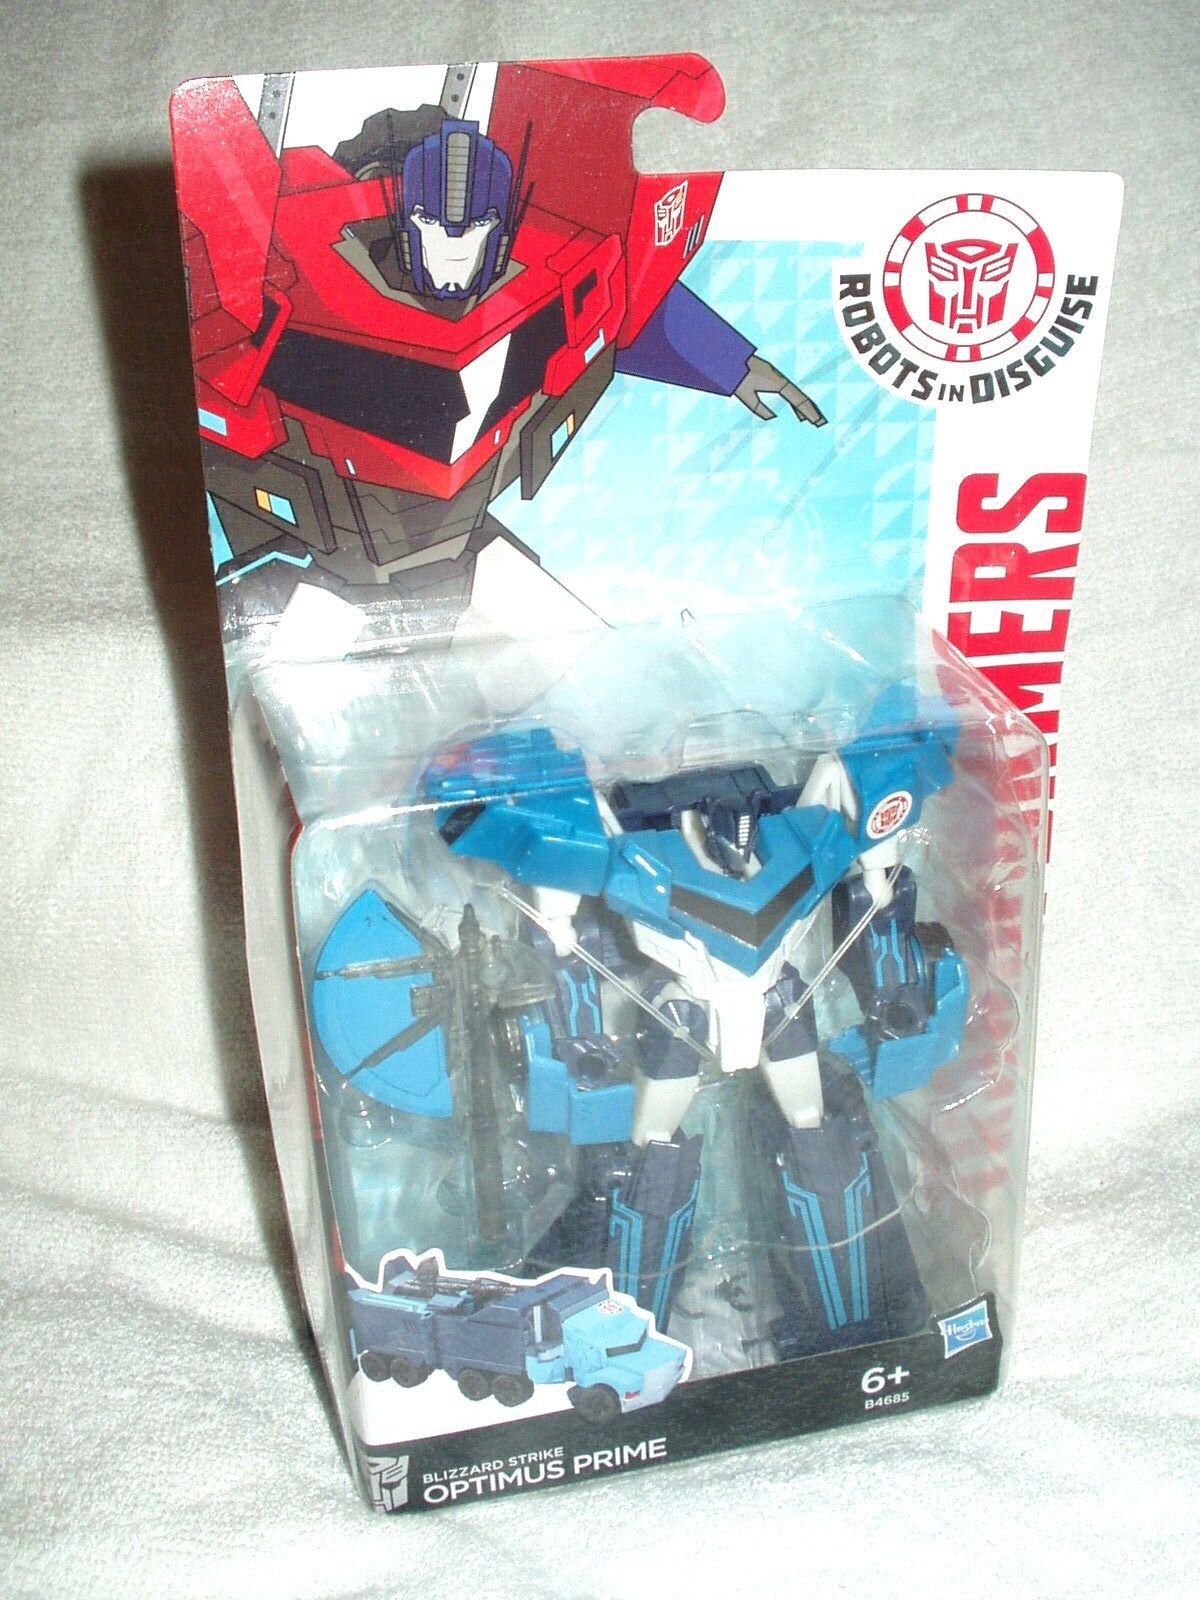 Transformers Action Figure Figure Figure Deluxe RID Blizzard Strike Optimus Prime 6 inch 26d981